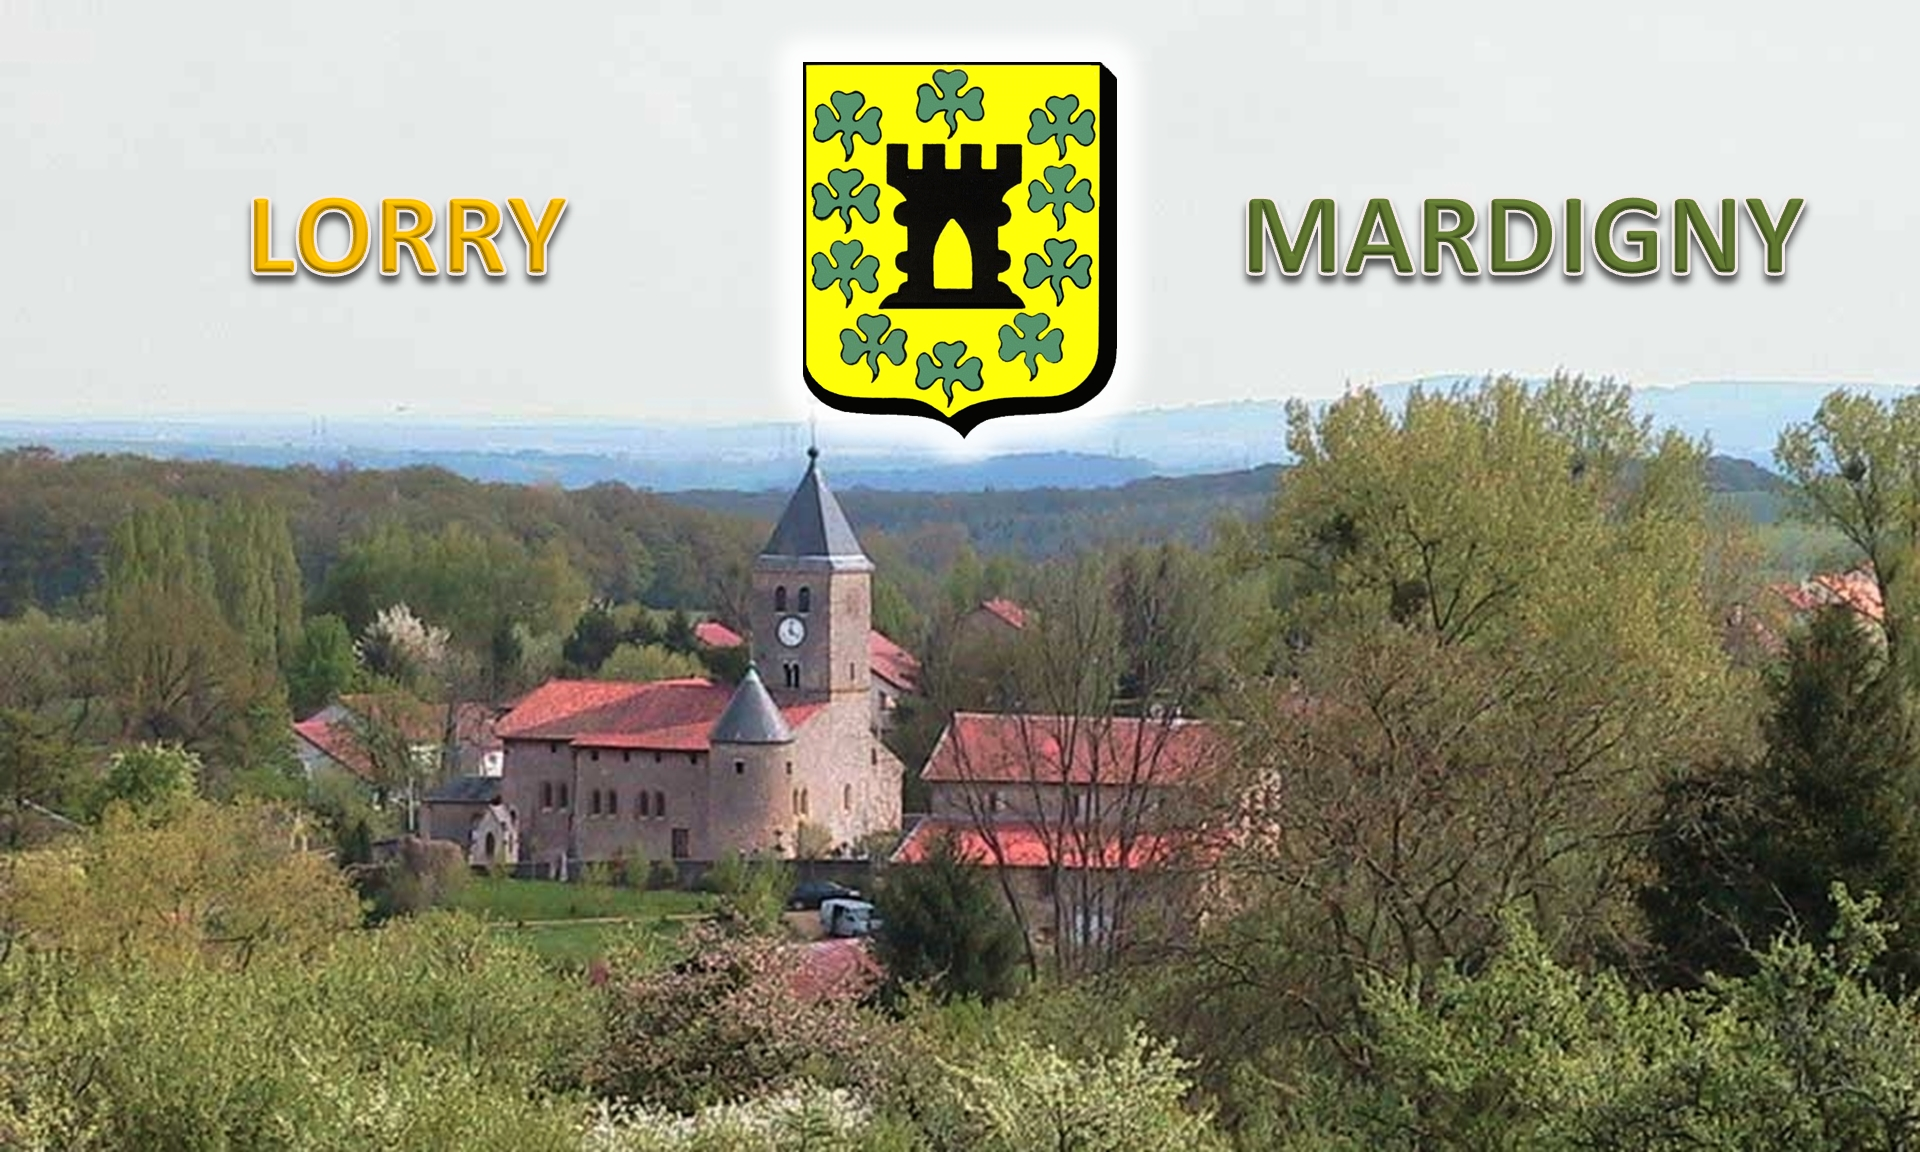 Lorry - Mardigny